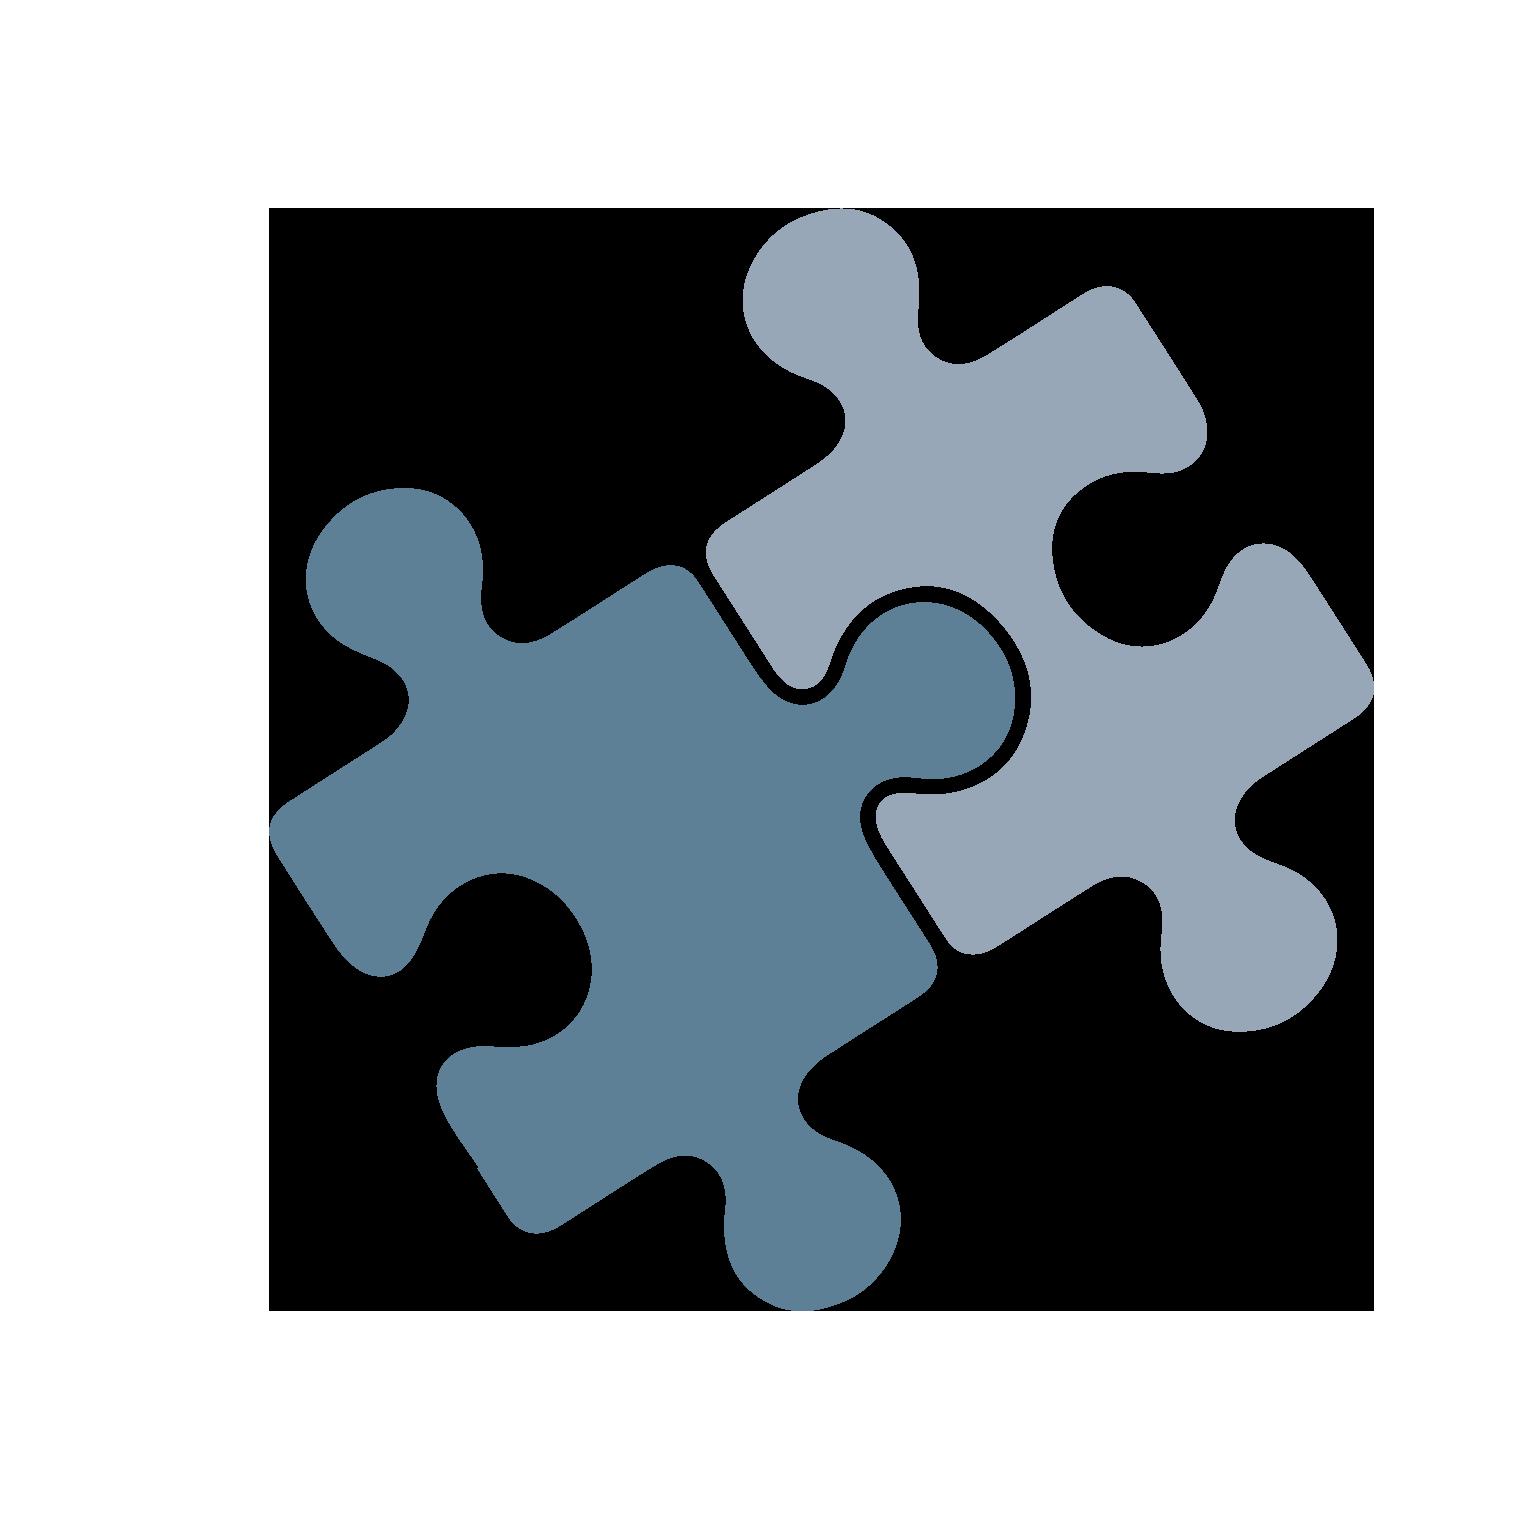 YOH_Illustration-puzzle-piece